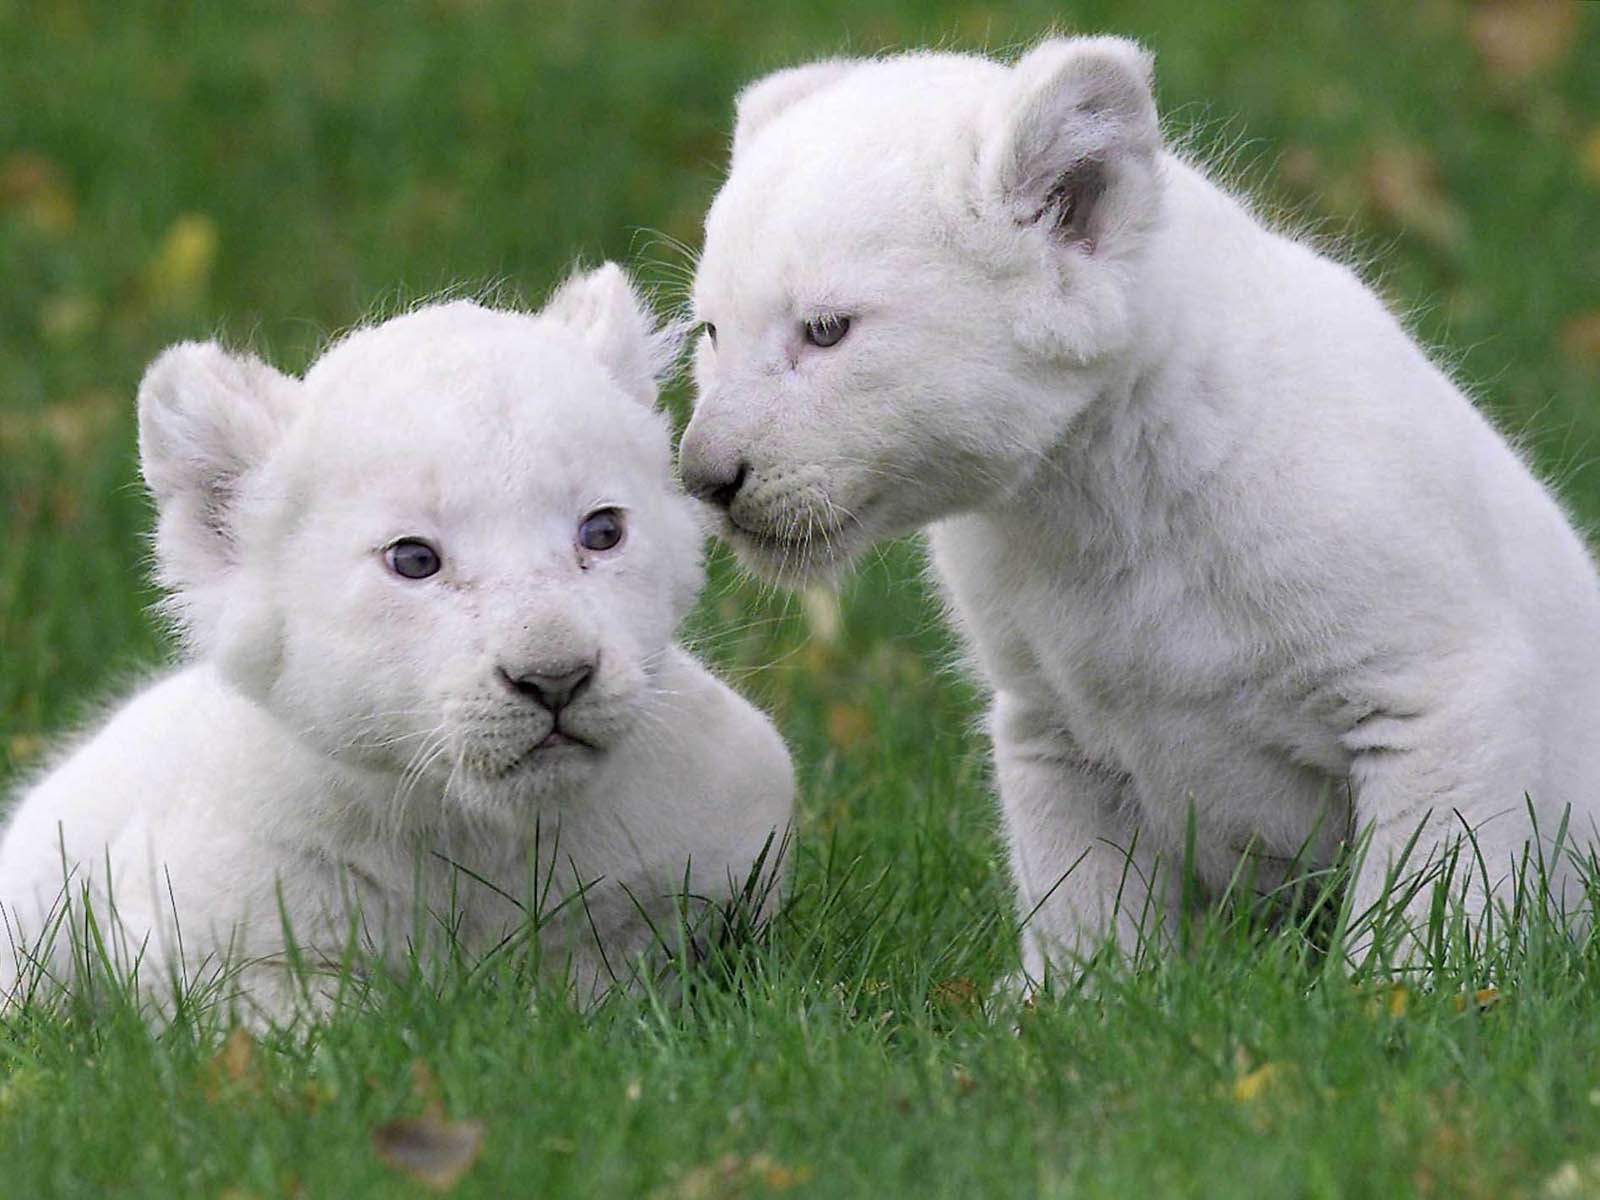 White Lion Cubs Wallpaper